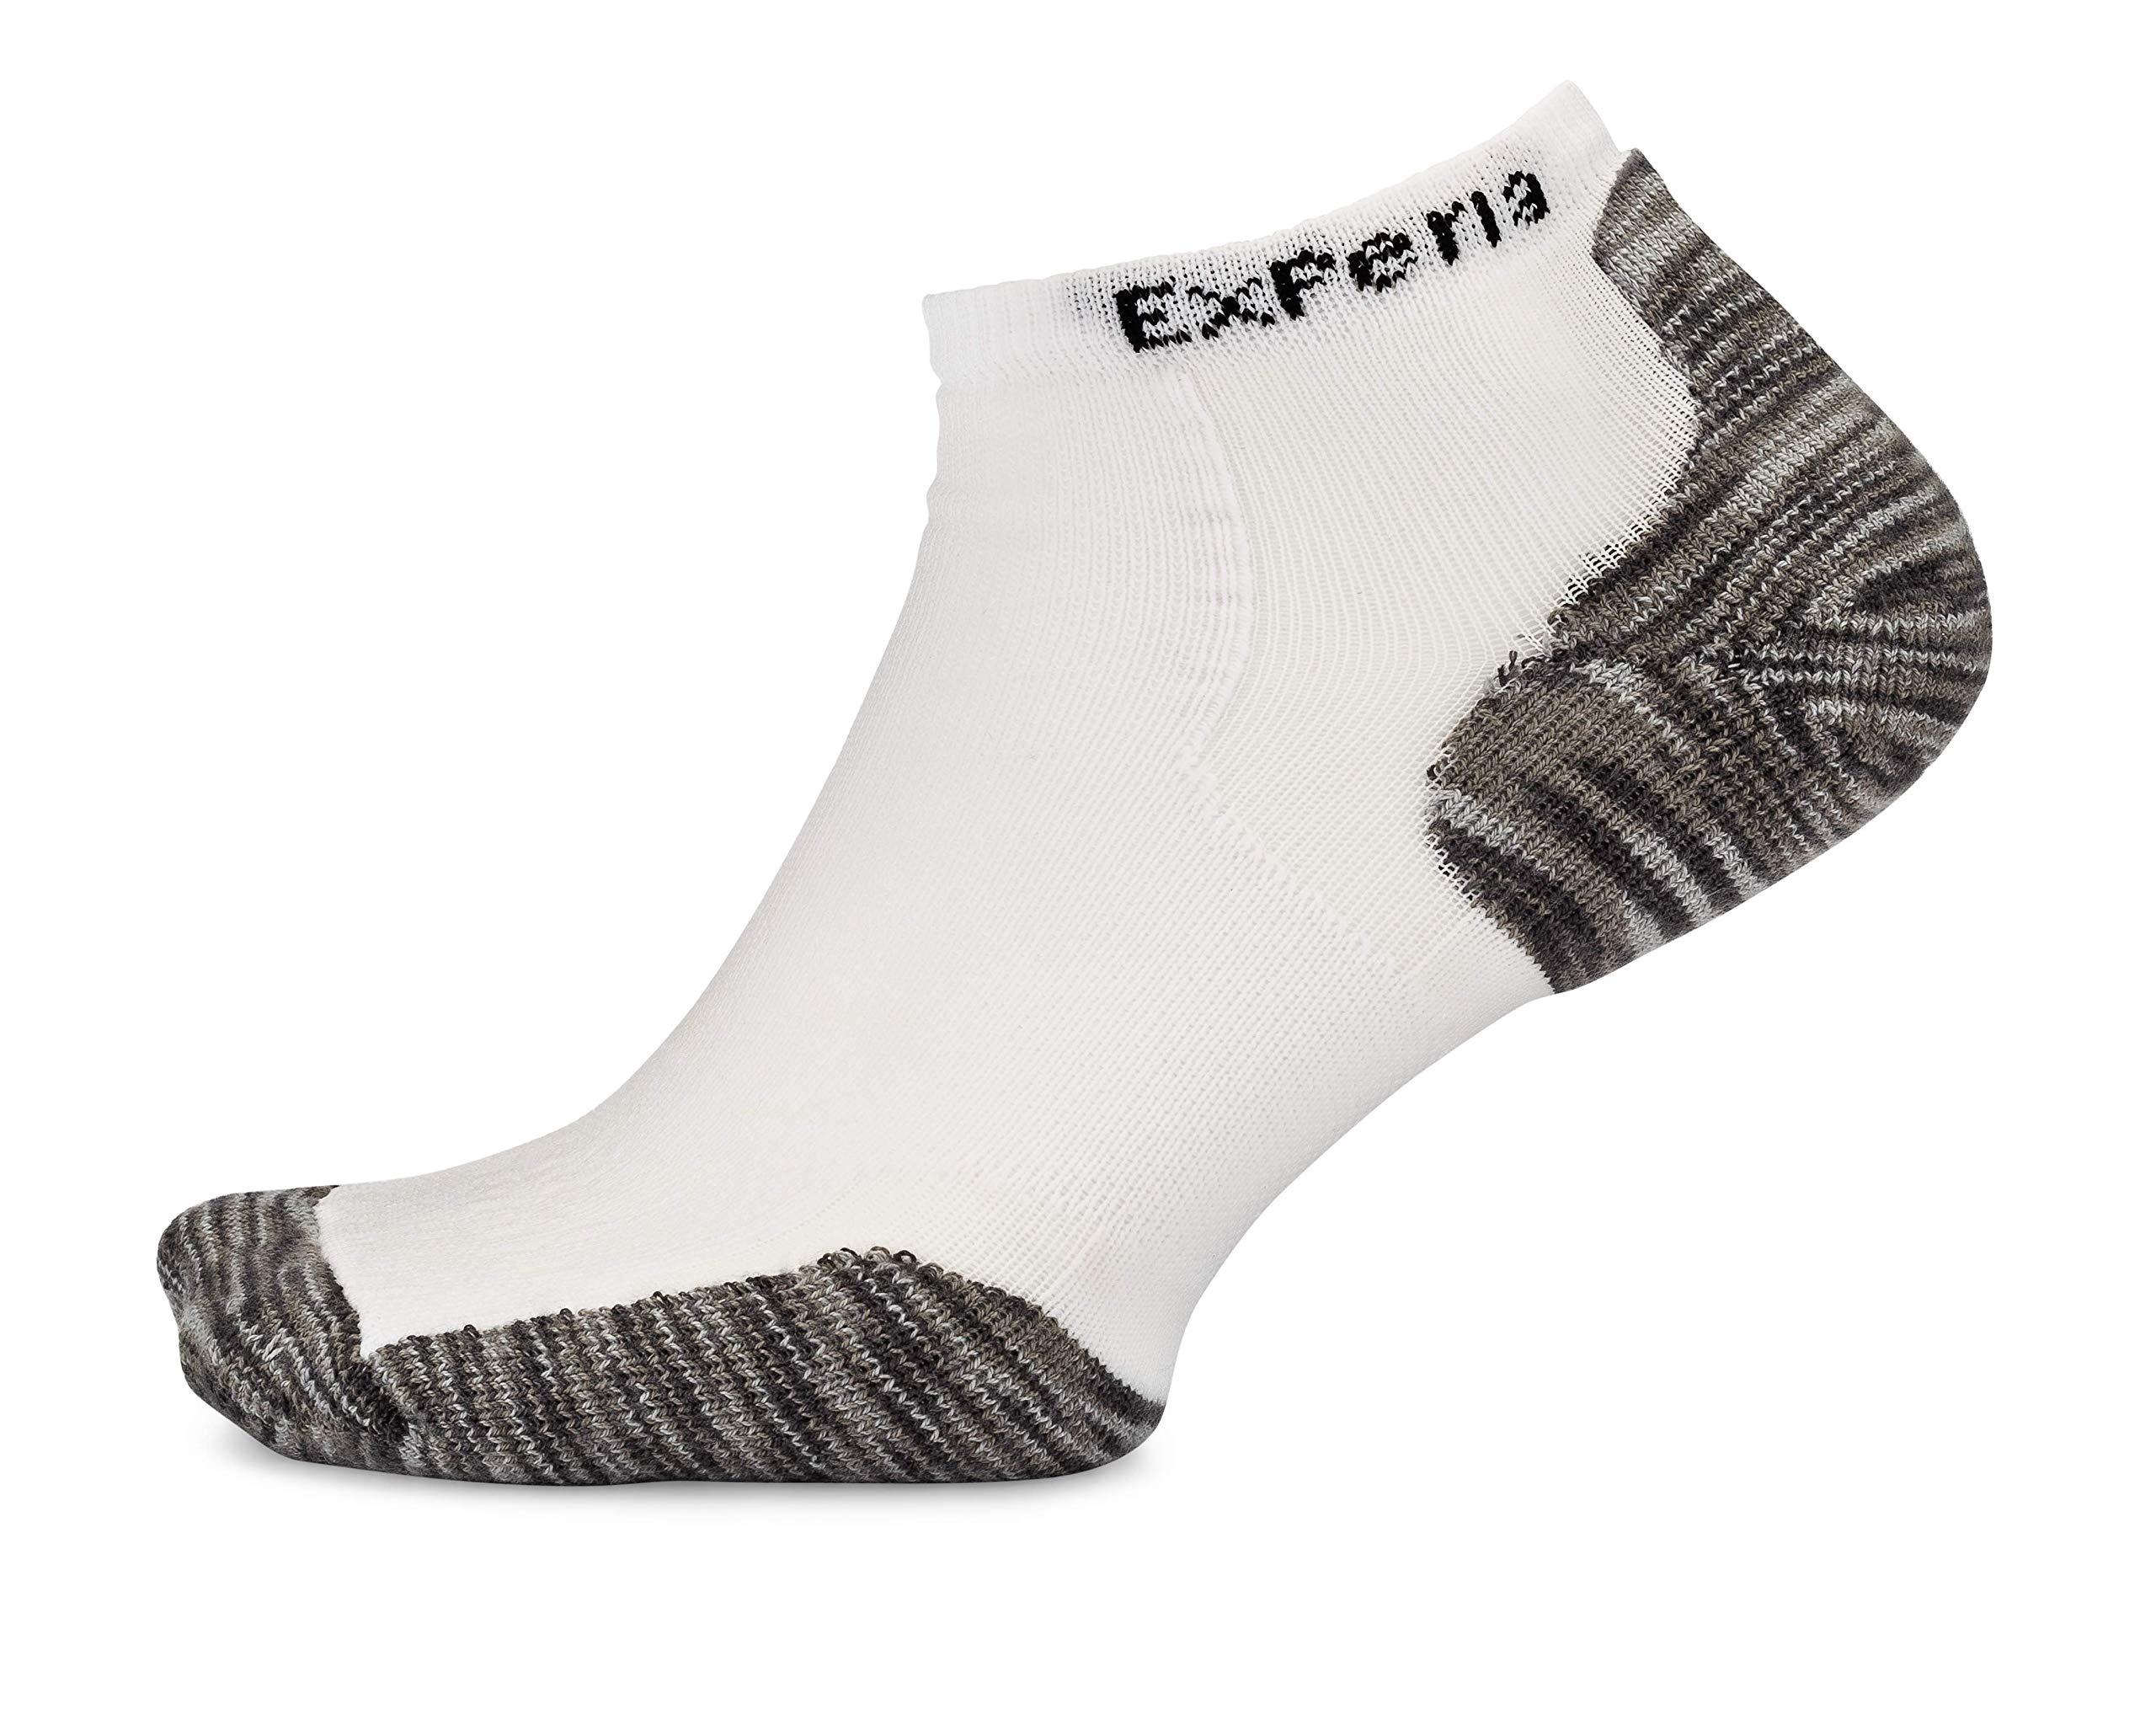 Thorlos Experia XCCU Thin Cushion Running Low Cut Sock, Tiger Paw White/Grey, S by Thorlos Experia